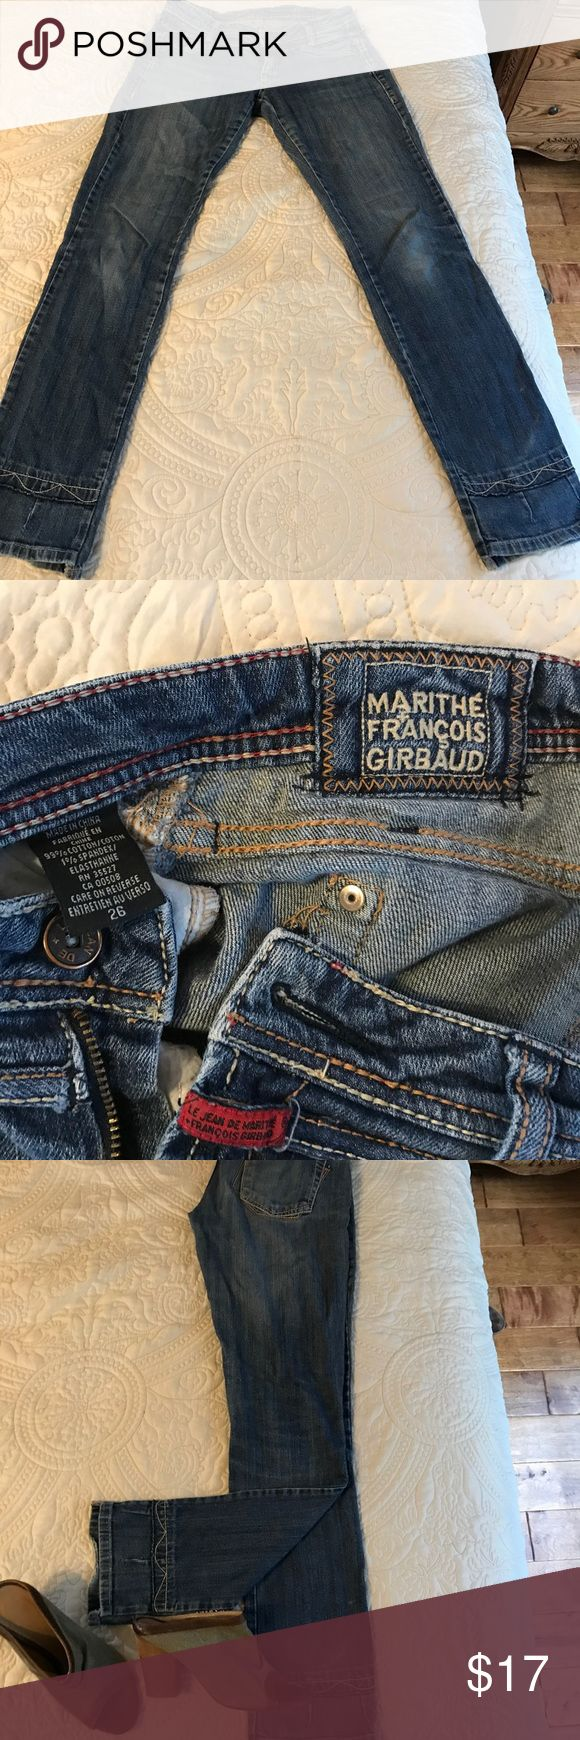 Jeans Marithe Francois Girbaud Jeans Marithe Francois Girbaud, s. 26 GENTLY USED Marithe Francois Girbaud Jeans Straight Leg